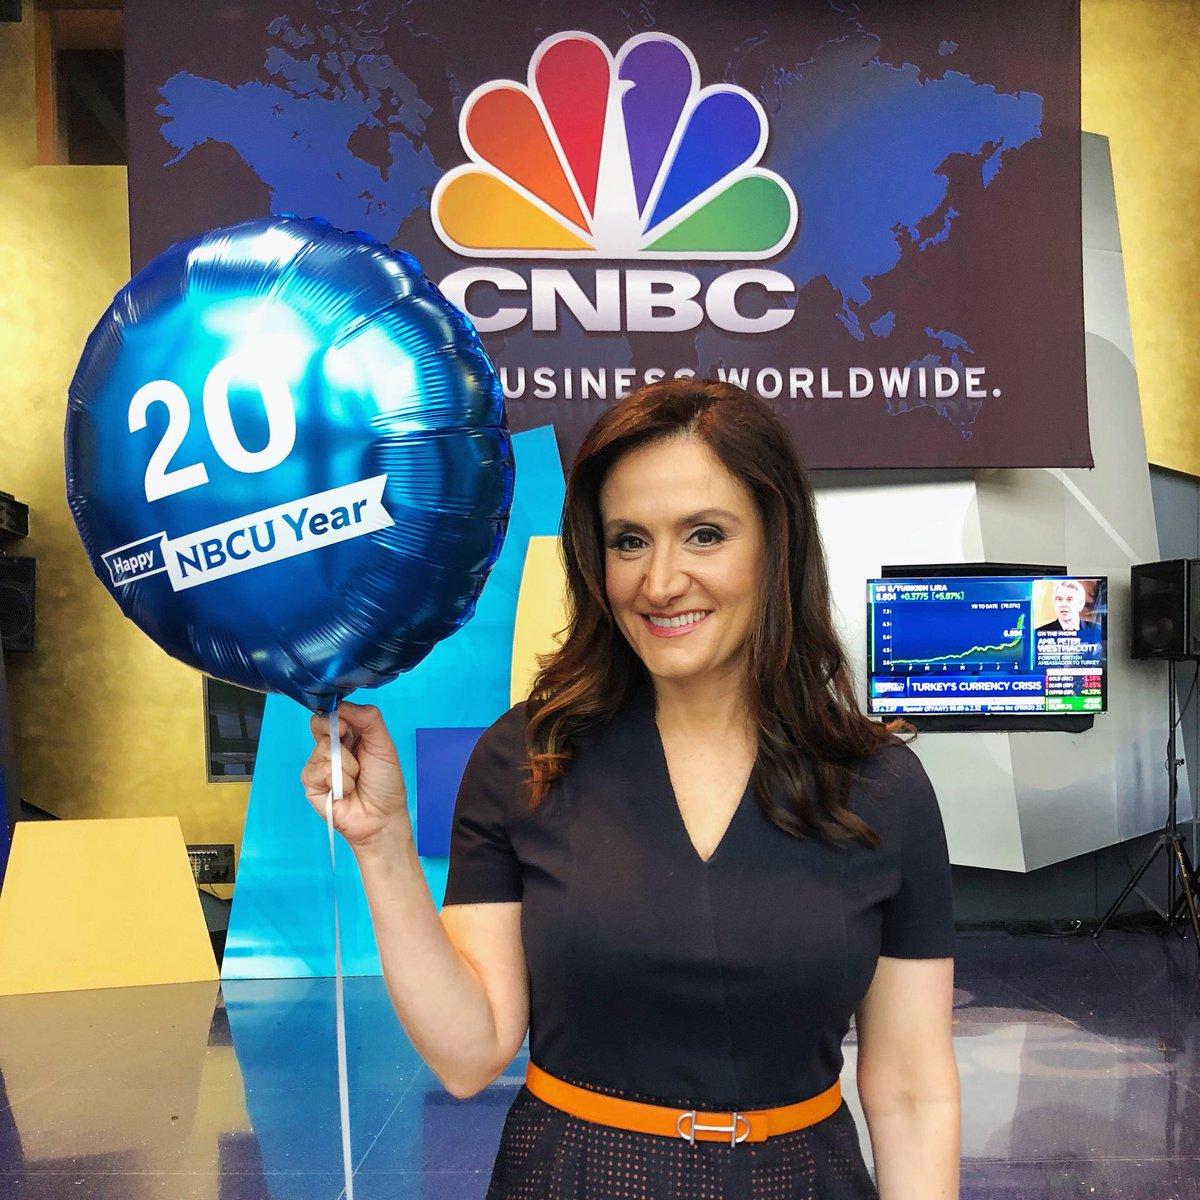 RT @MCaruso_Cabrera: Celebrating 2 decades at CNBC! https://t.co/ut55enwDUe